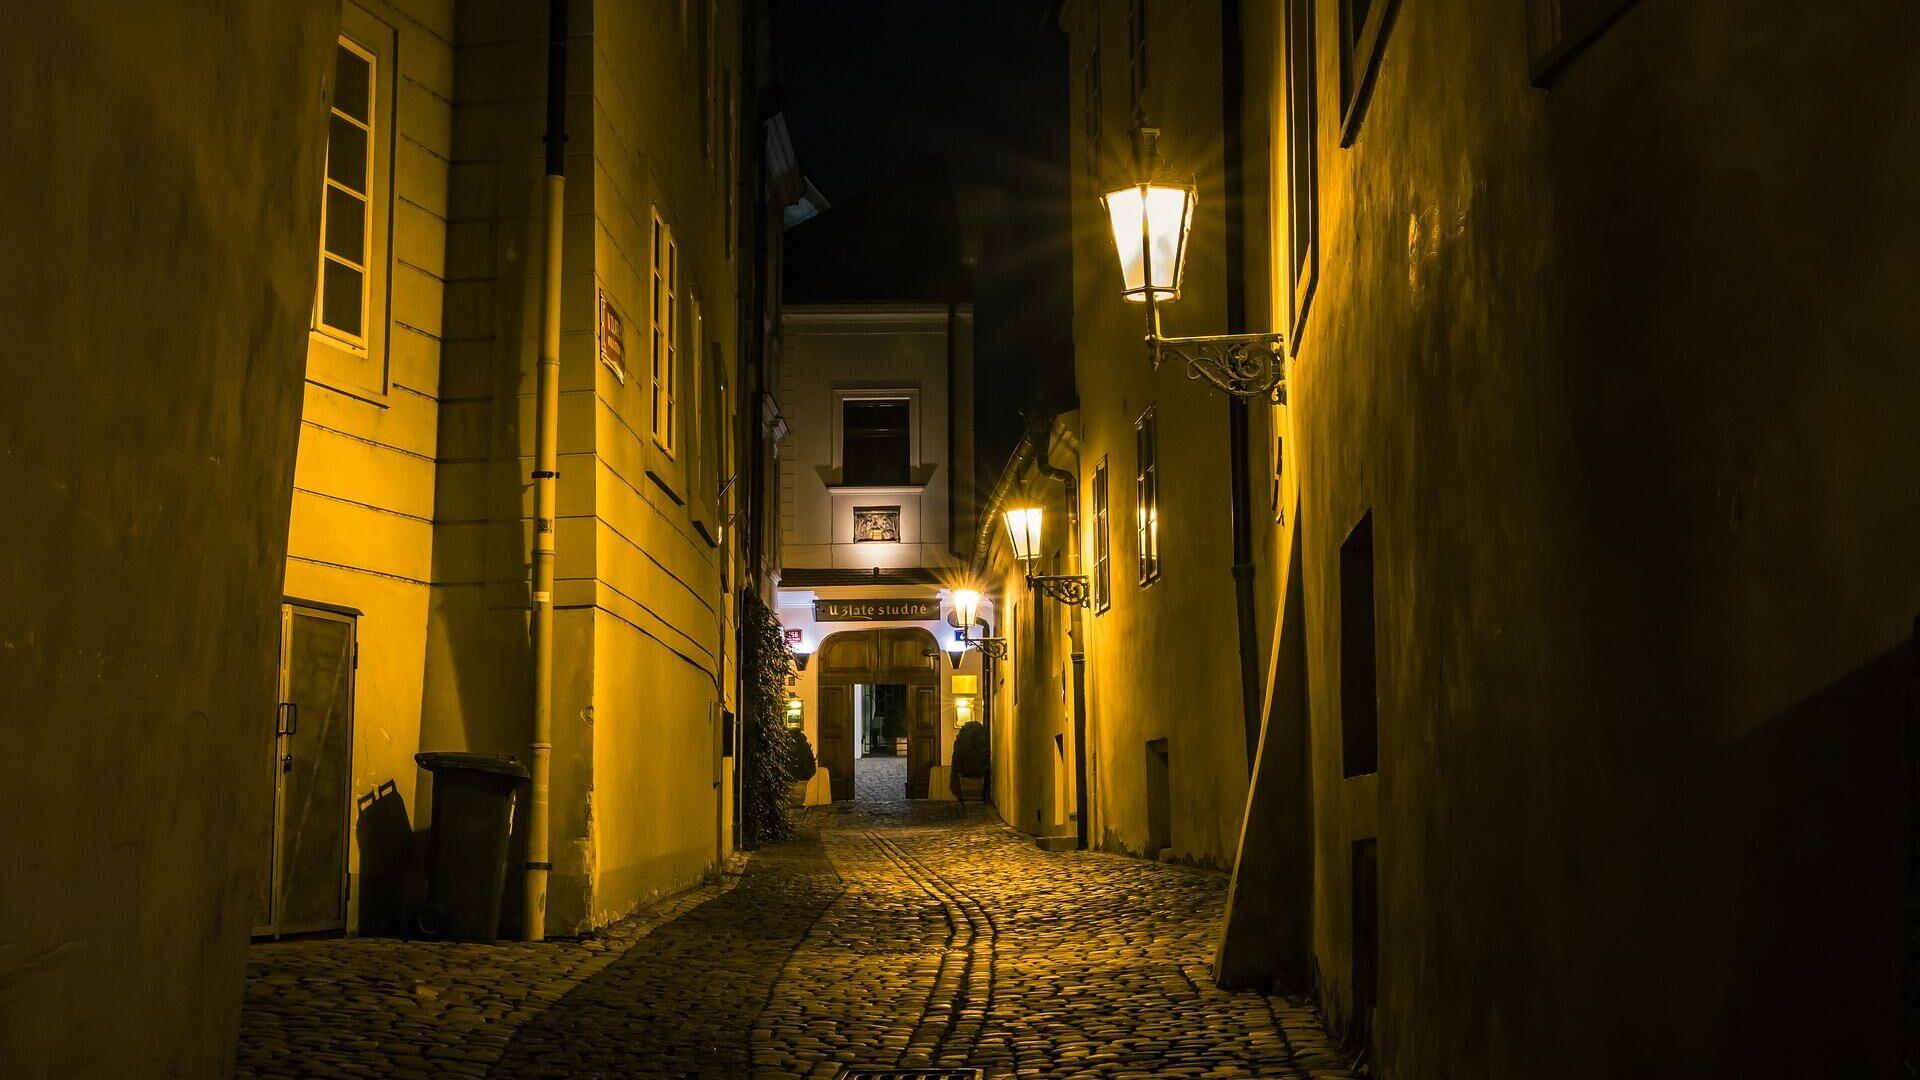 Una calle medieval de noche - Sputnik Mundo, 1920, 16.04.2021